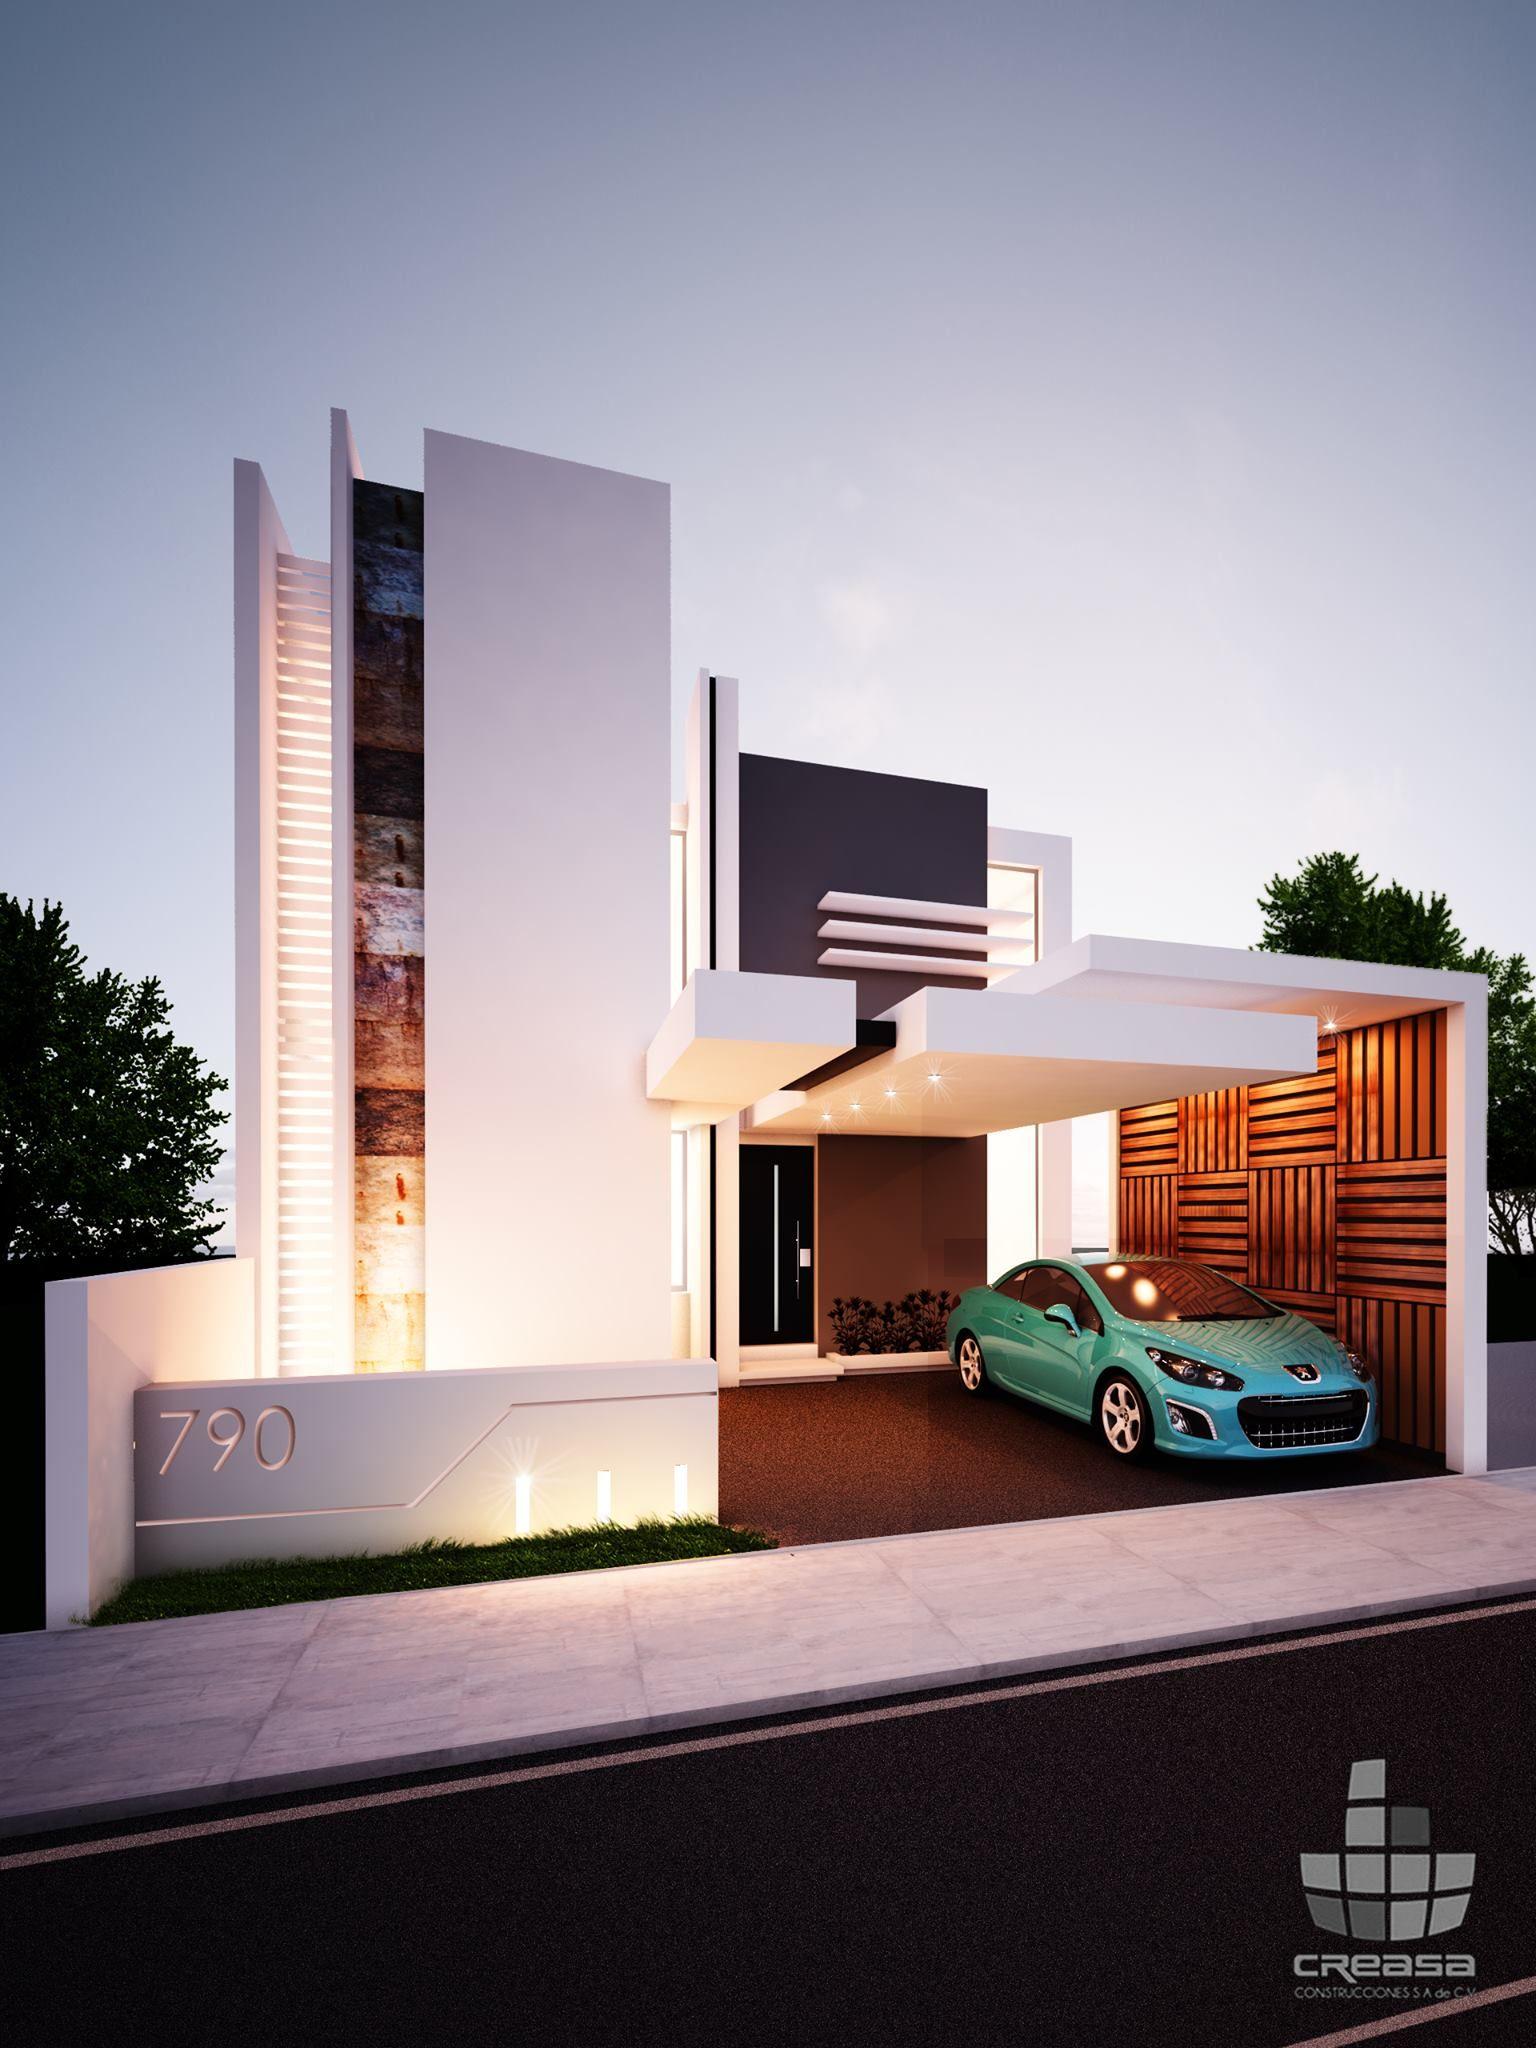 Creasa | Creasa MX | Pinterest | Architektur, Hauseingang und ...